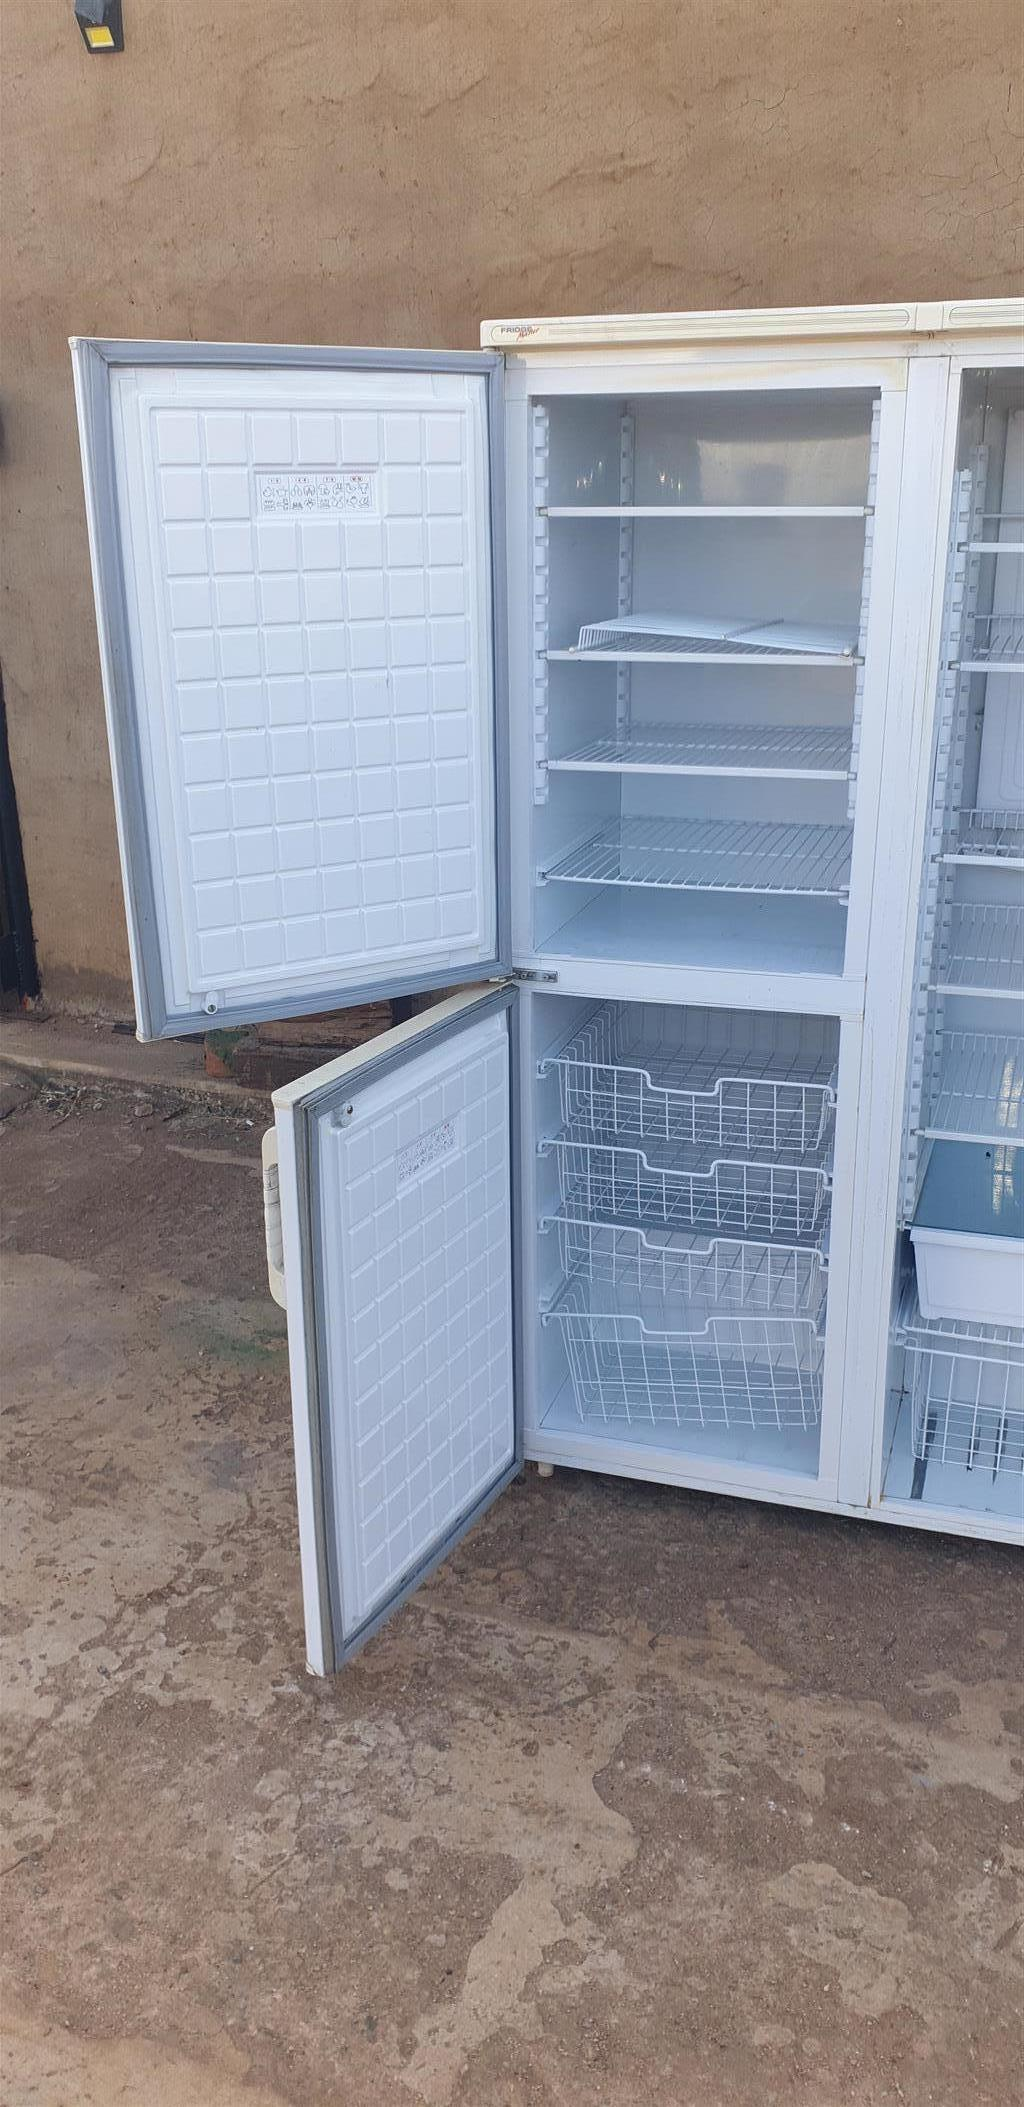 Fridge Master 3 door fridge freezer